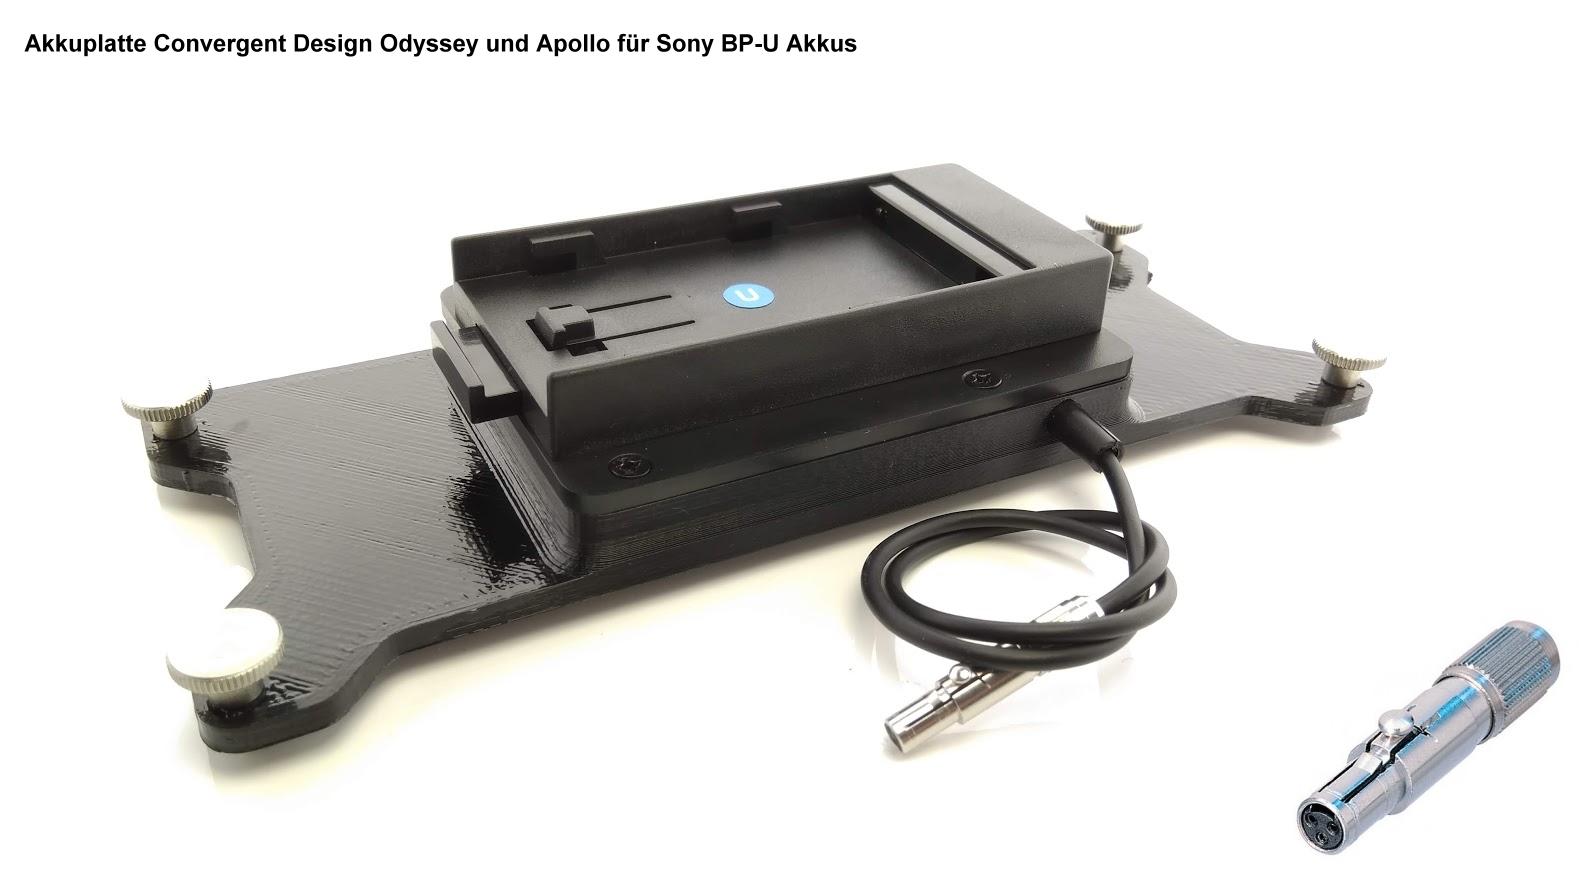 Artikelfoto 1 FineVideo Sony BP-U Akkuplatte passend zu Convergent Odyssey Apollo CD-OD-SU